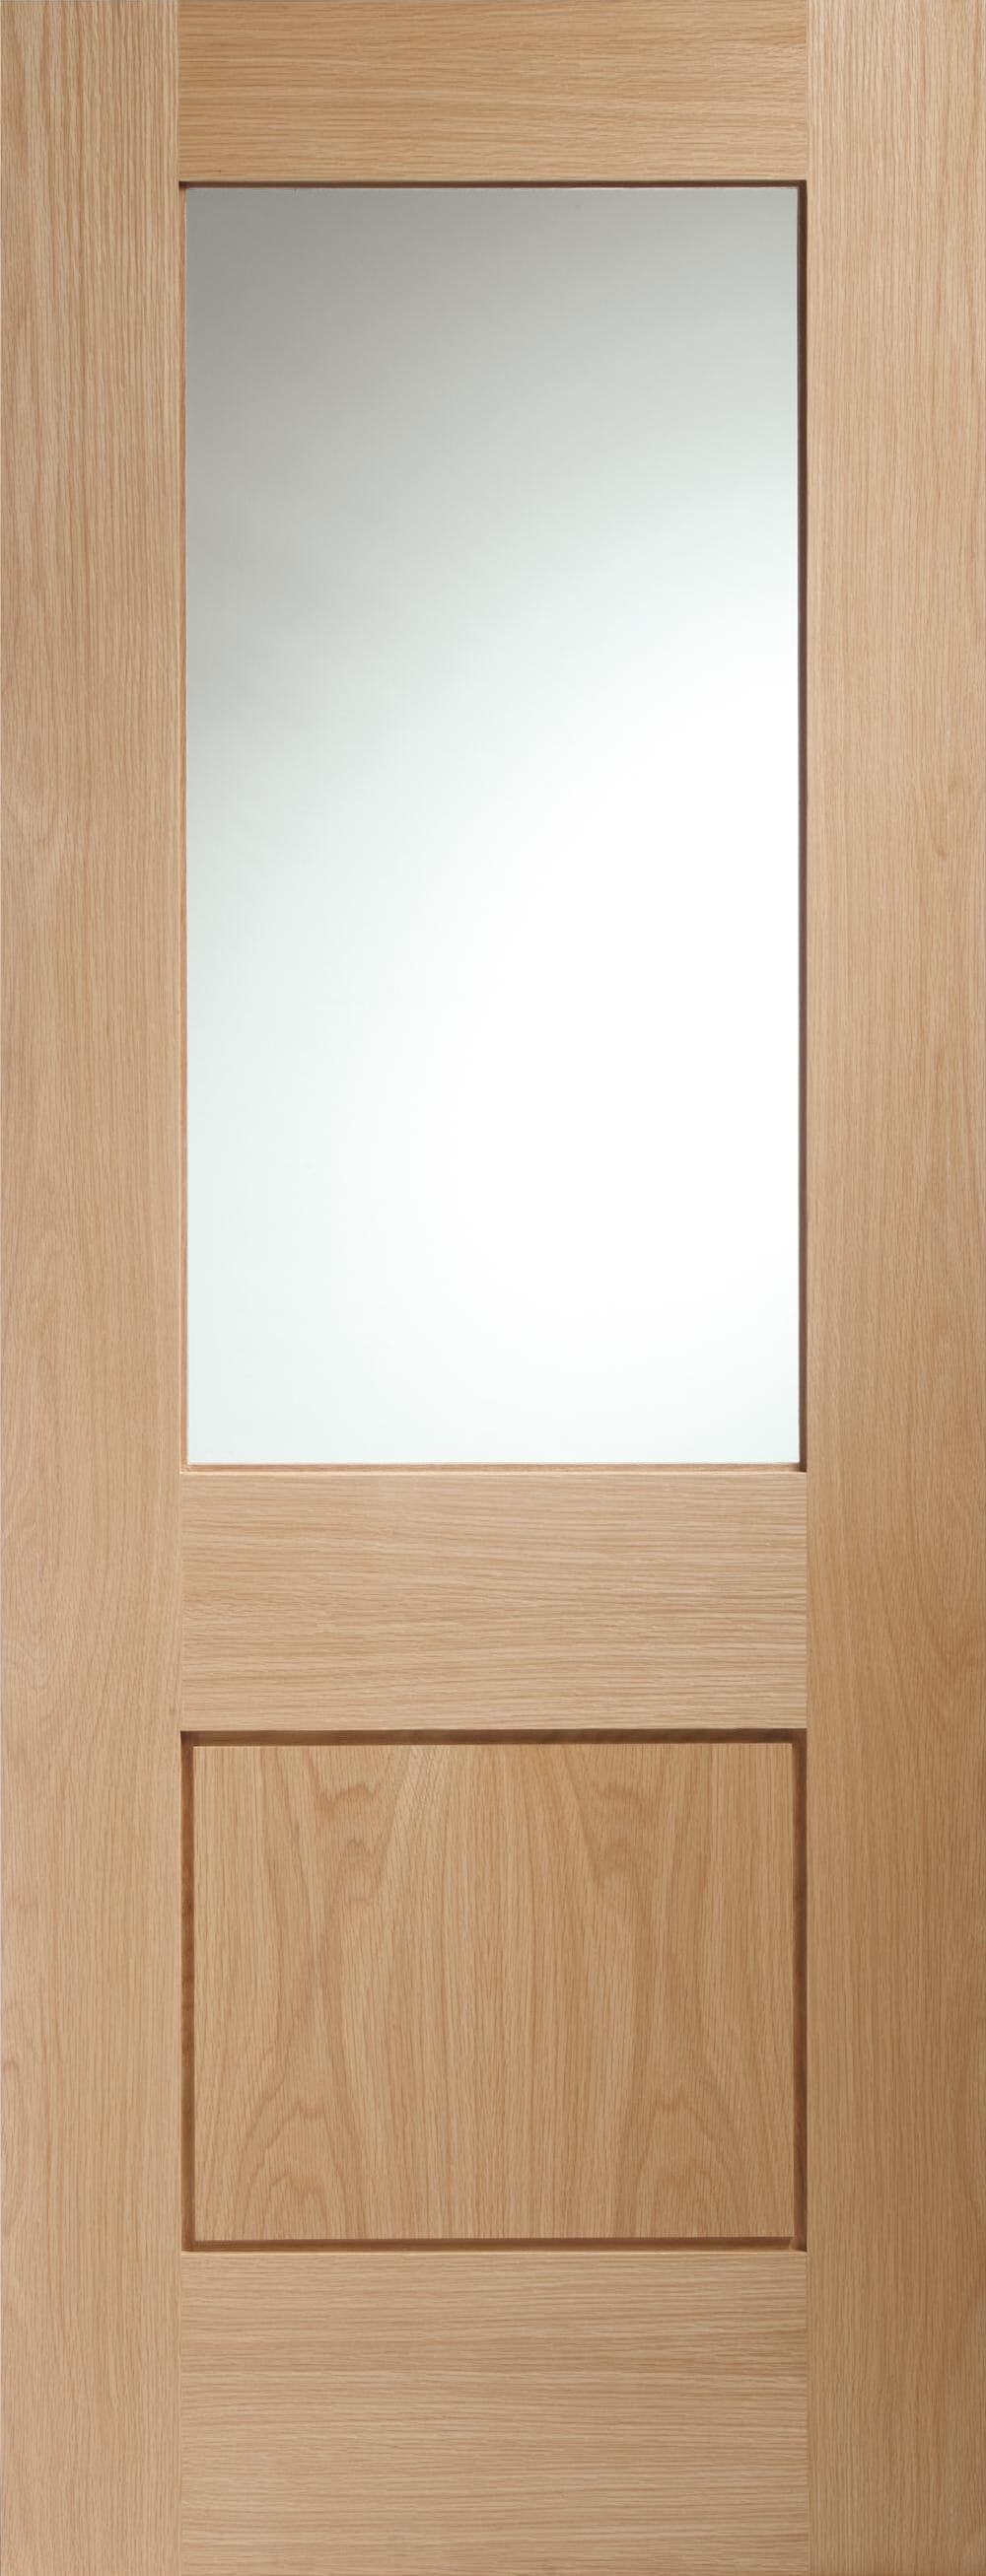 Piacenza Oak Clear Glazed - Xl Joinery  Image